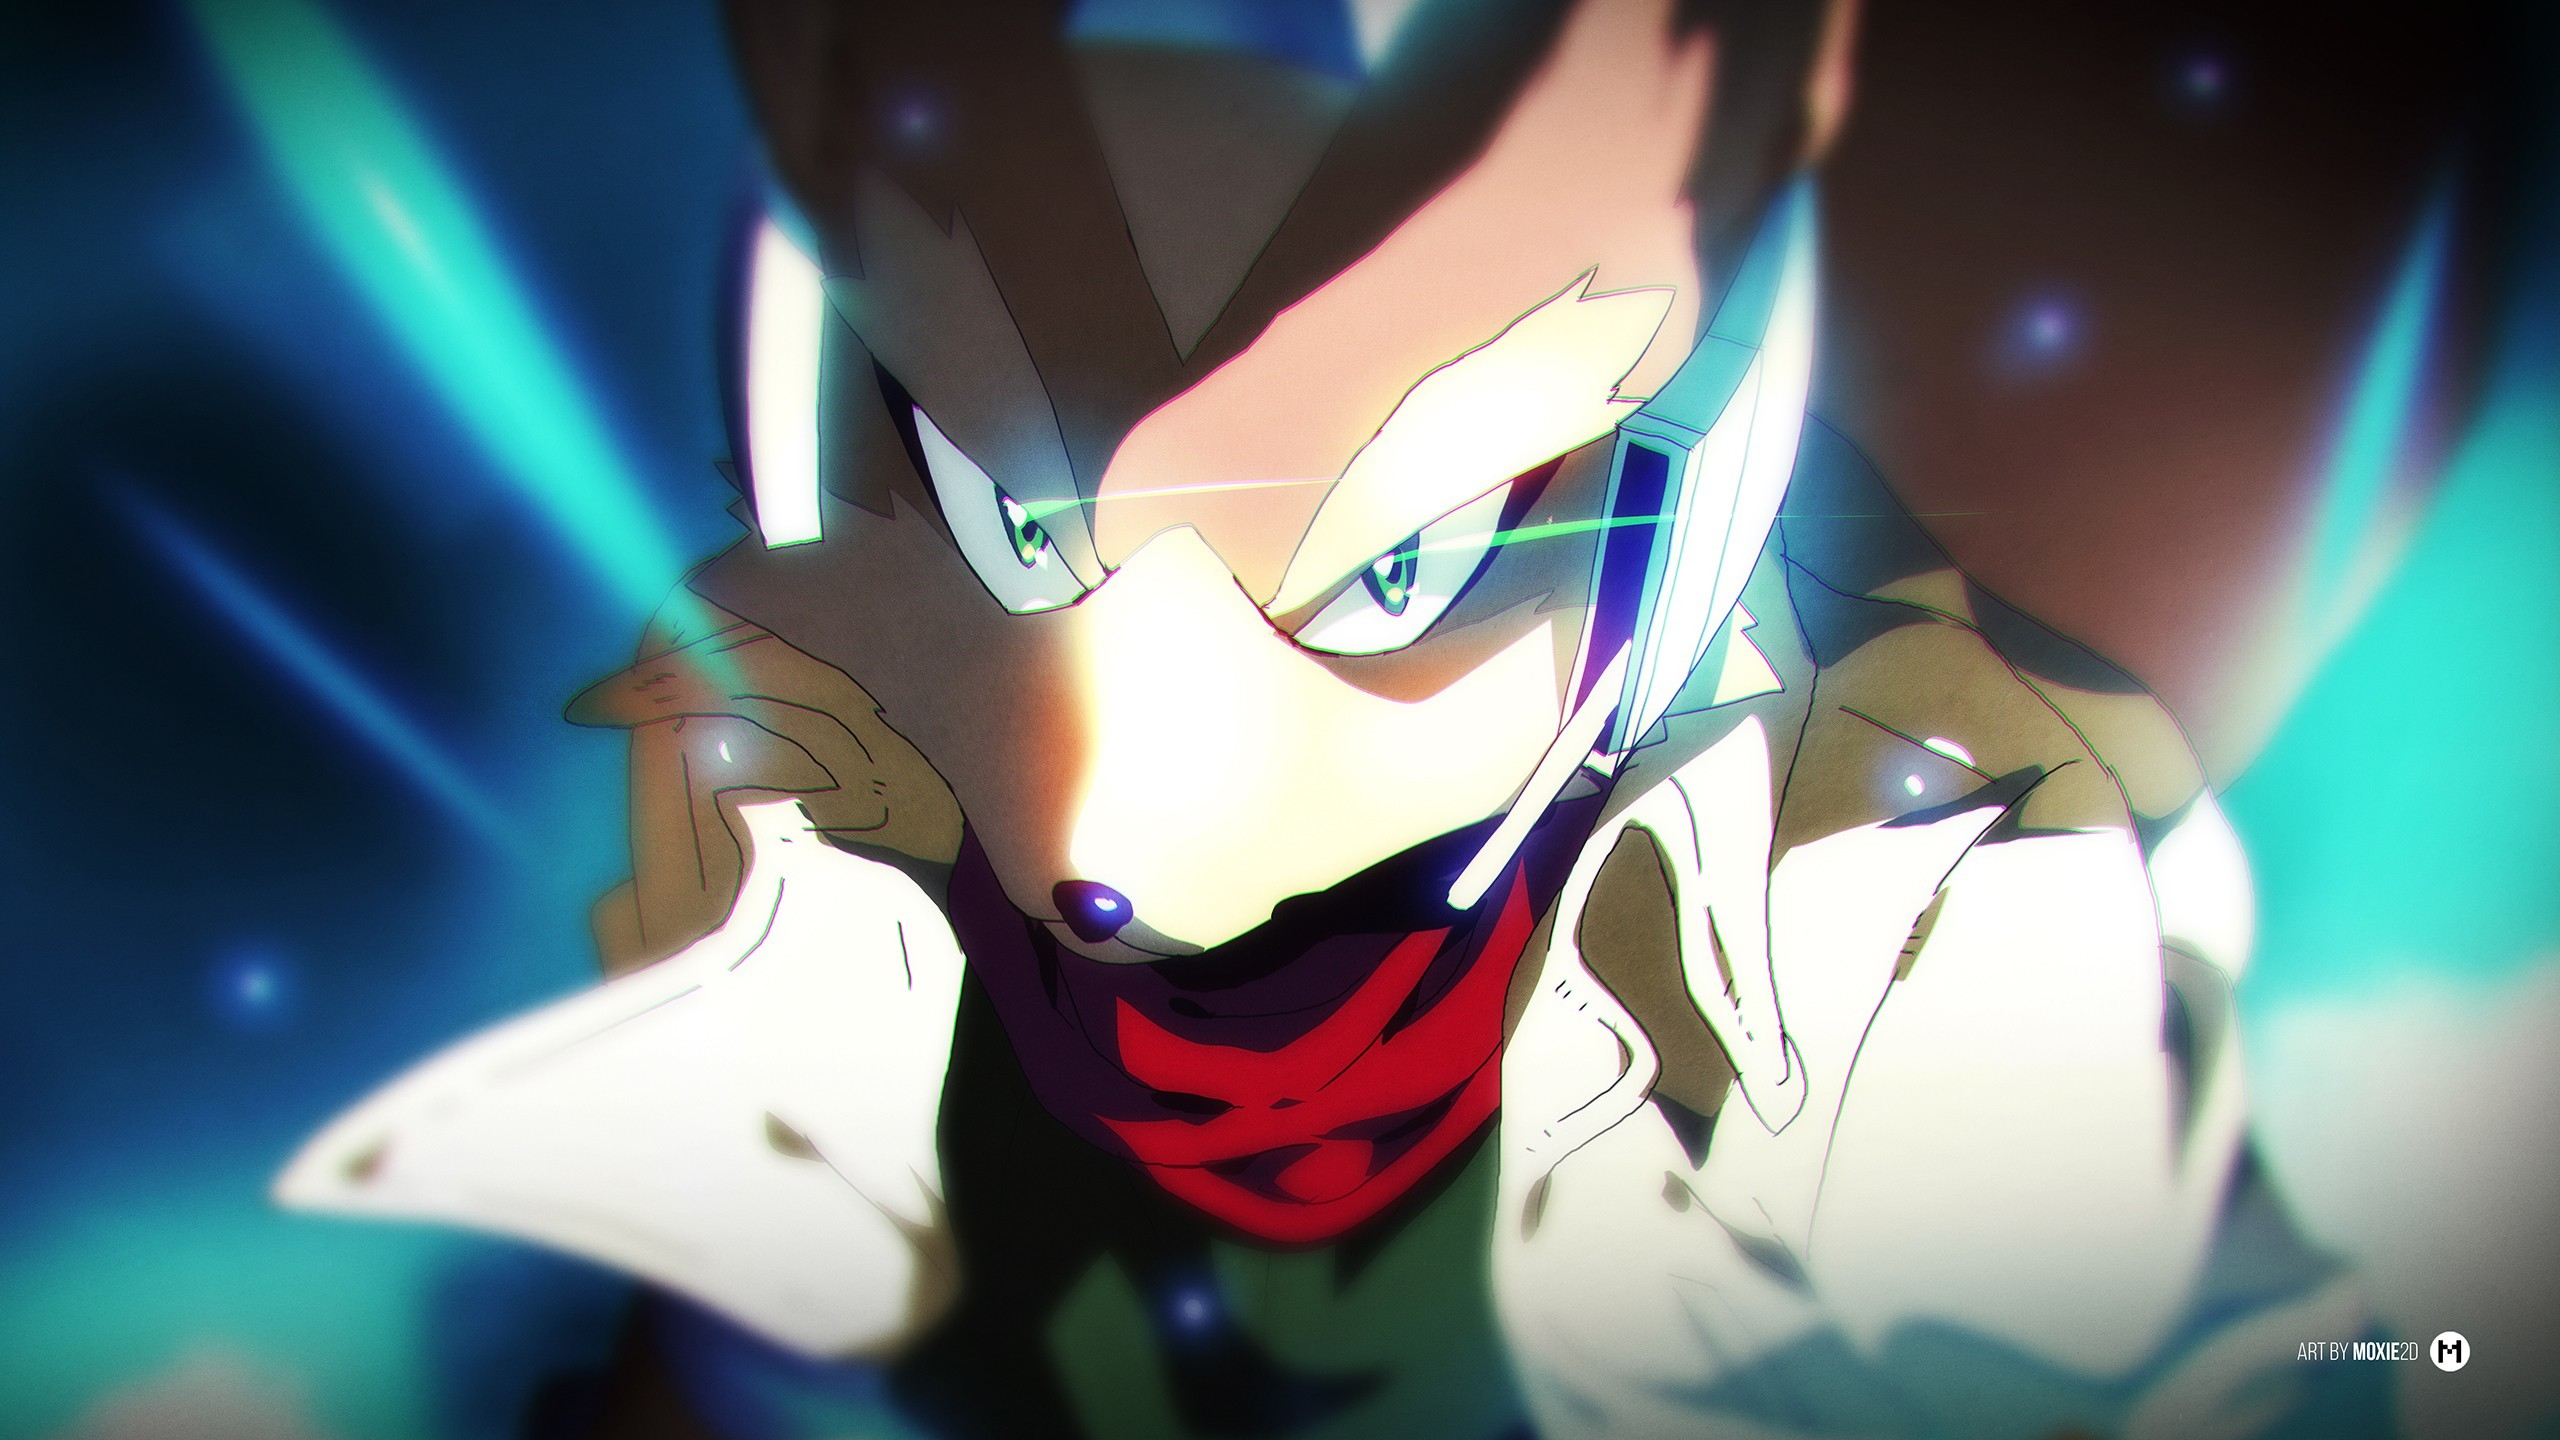 General Star Fox Fox McCloud Super Smash Brothers